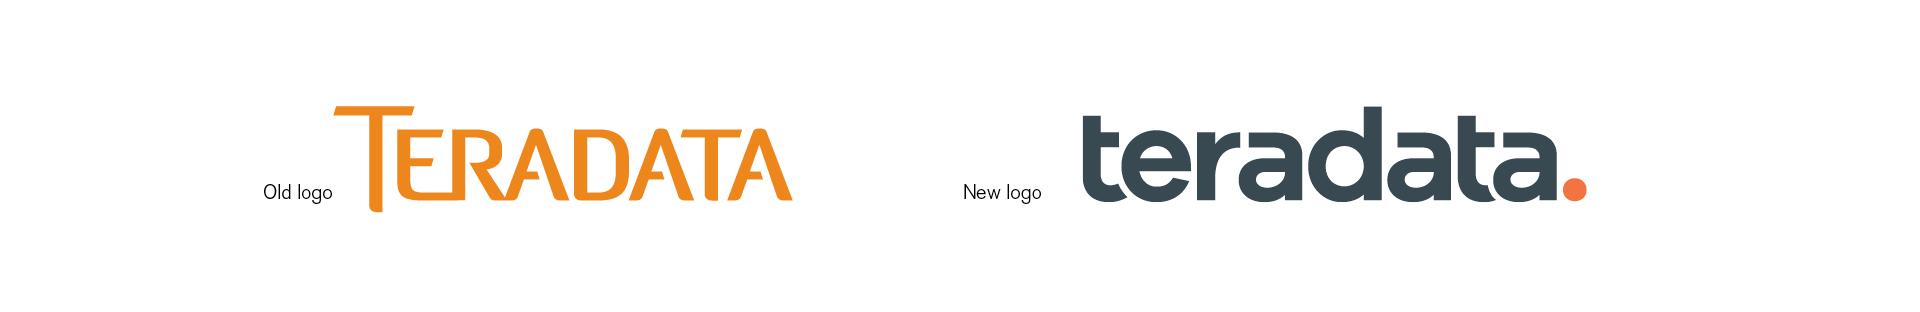 TD_Logo_Portfolio_Pages_v15